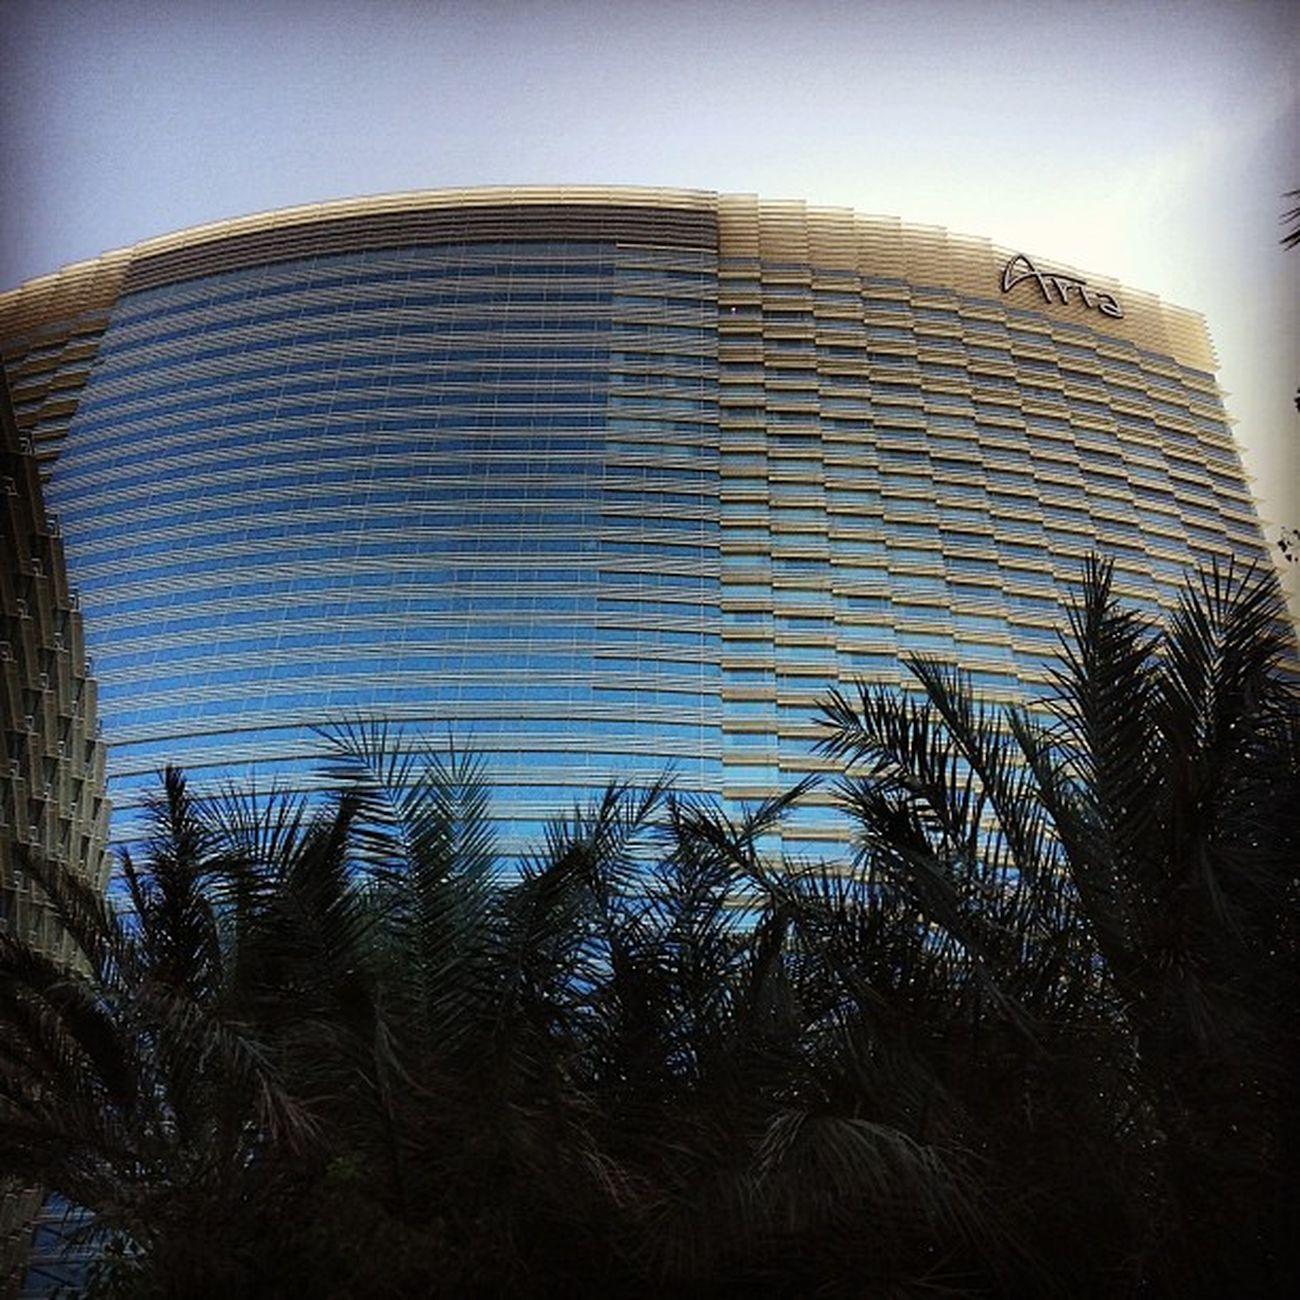 Aria Las Vegas Ariahotel Ariapool Pool Travel SinCity USA Swim Nevada Swimmingpool Vegas  Aria Lasvegas Honktravel